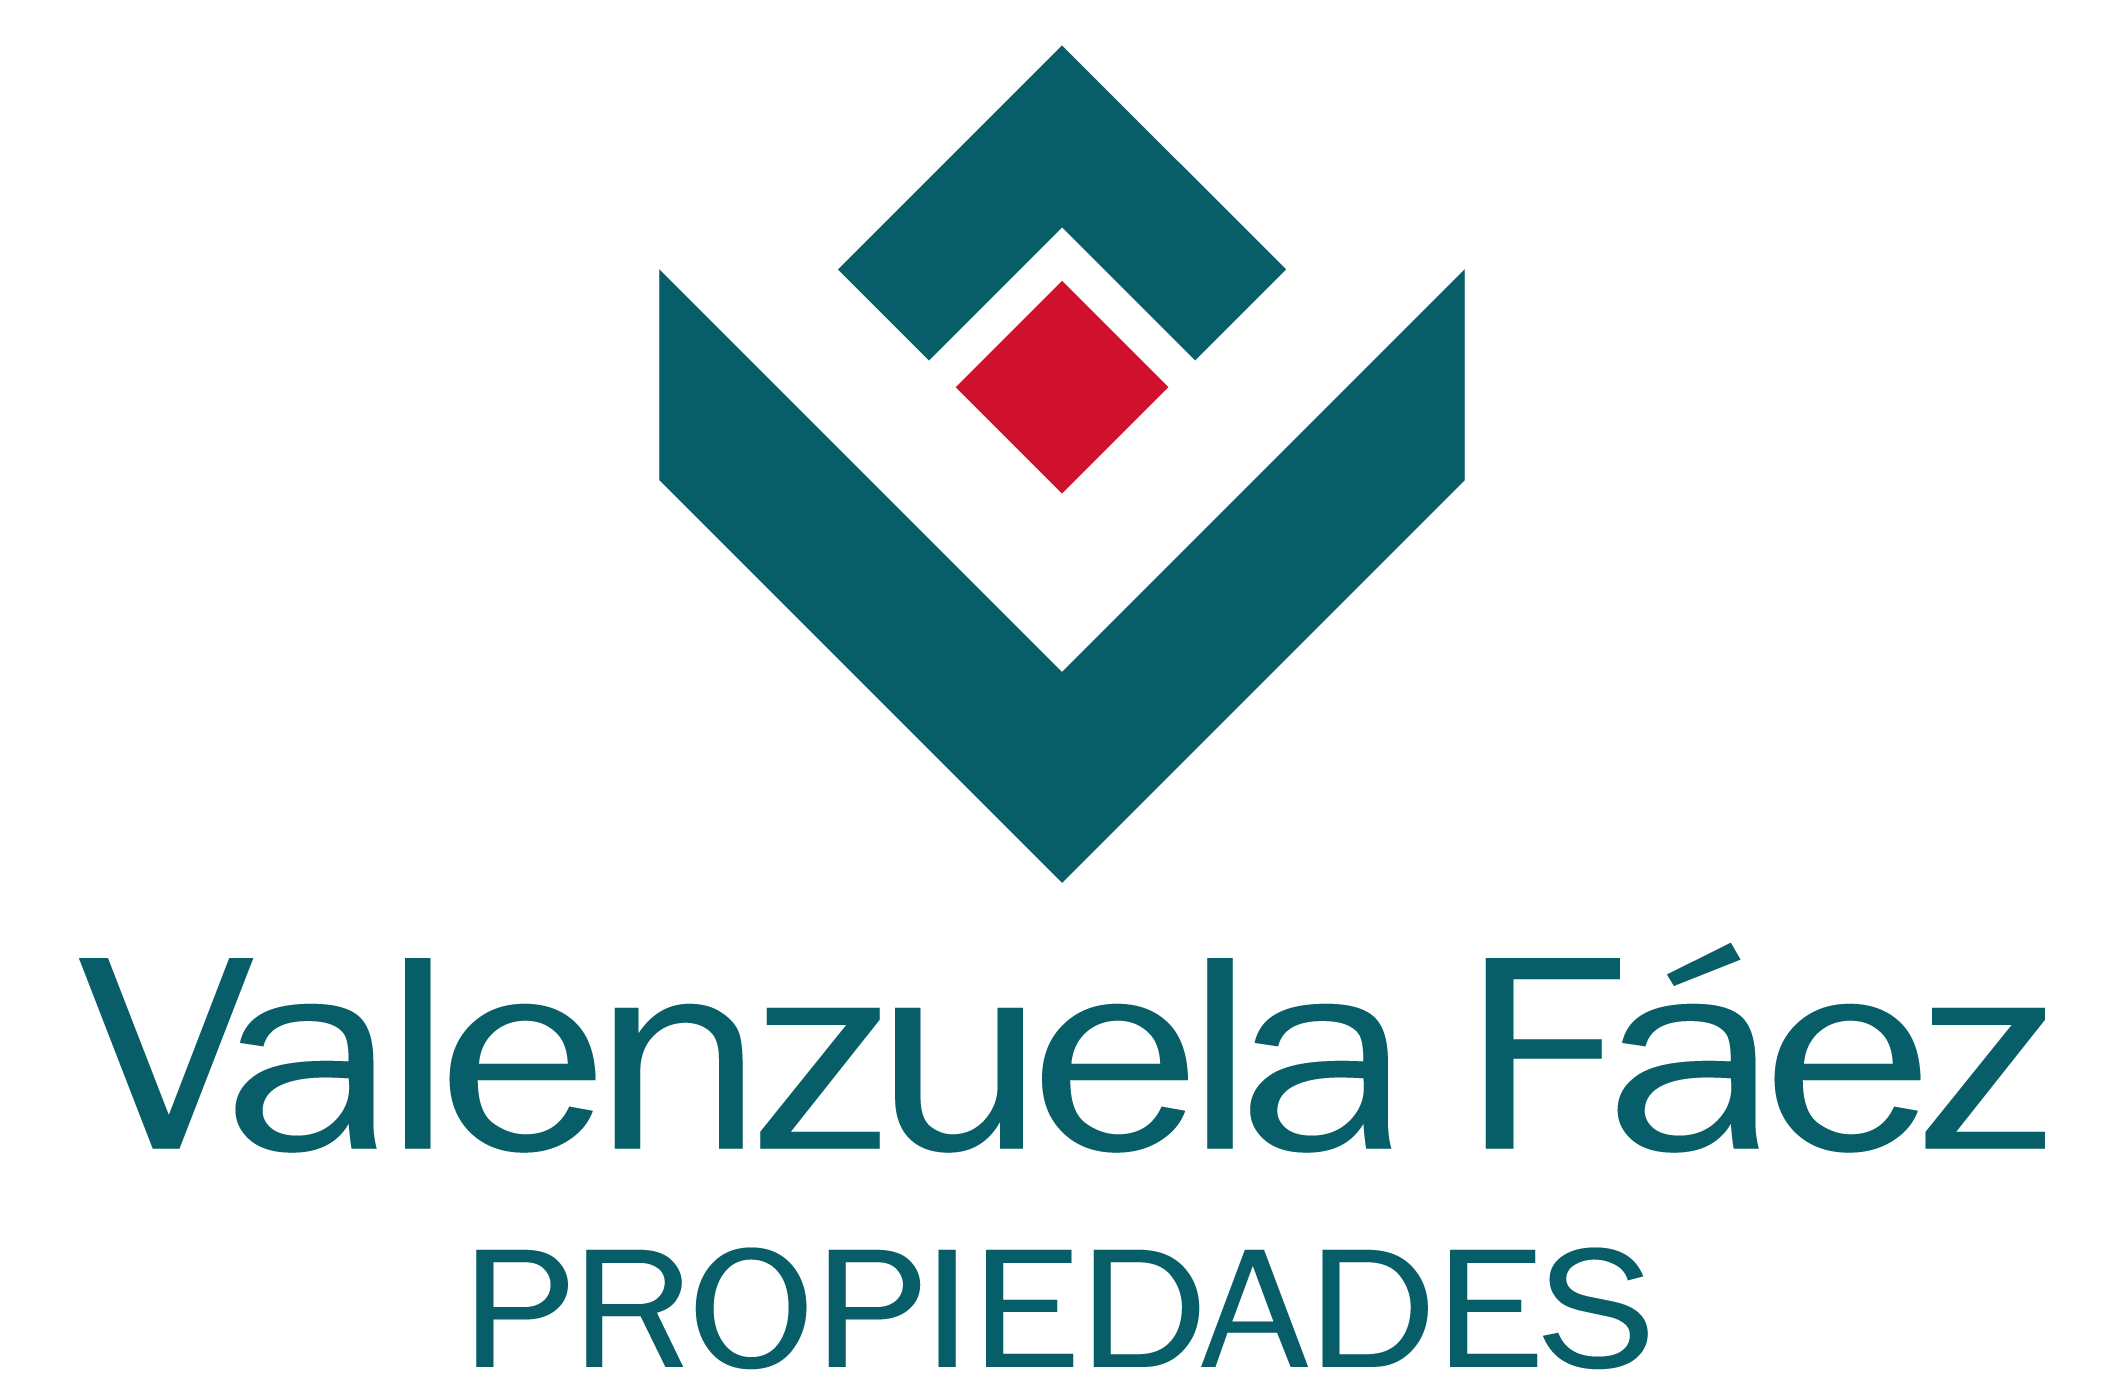 Valenzuela Fáez -Propiedades